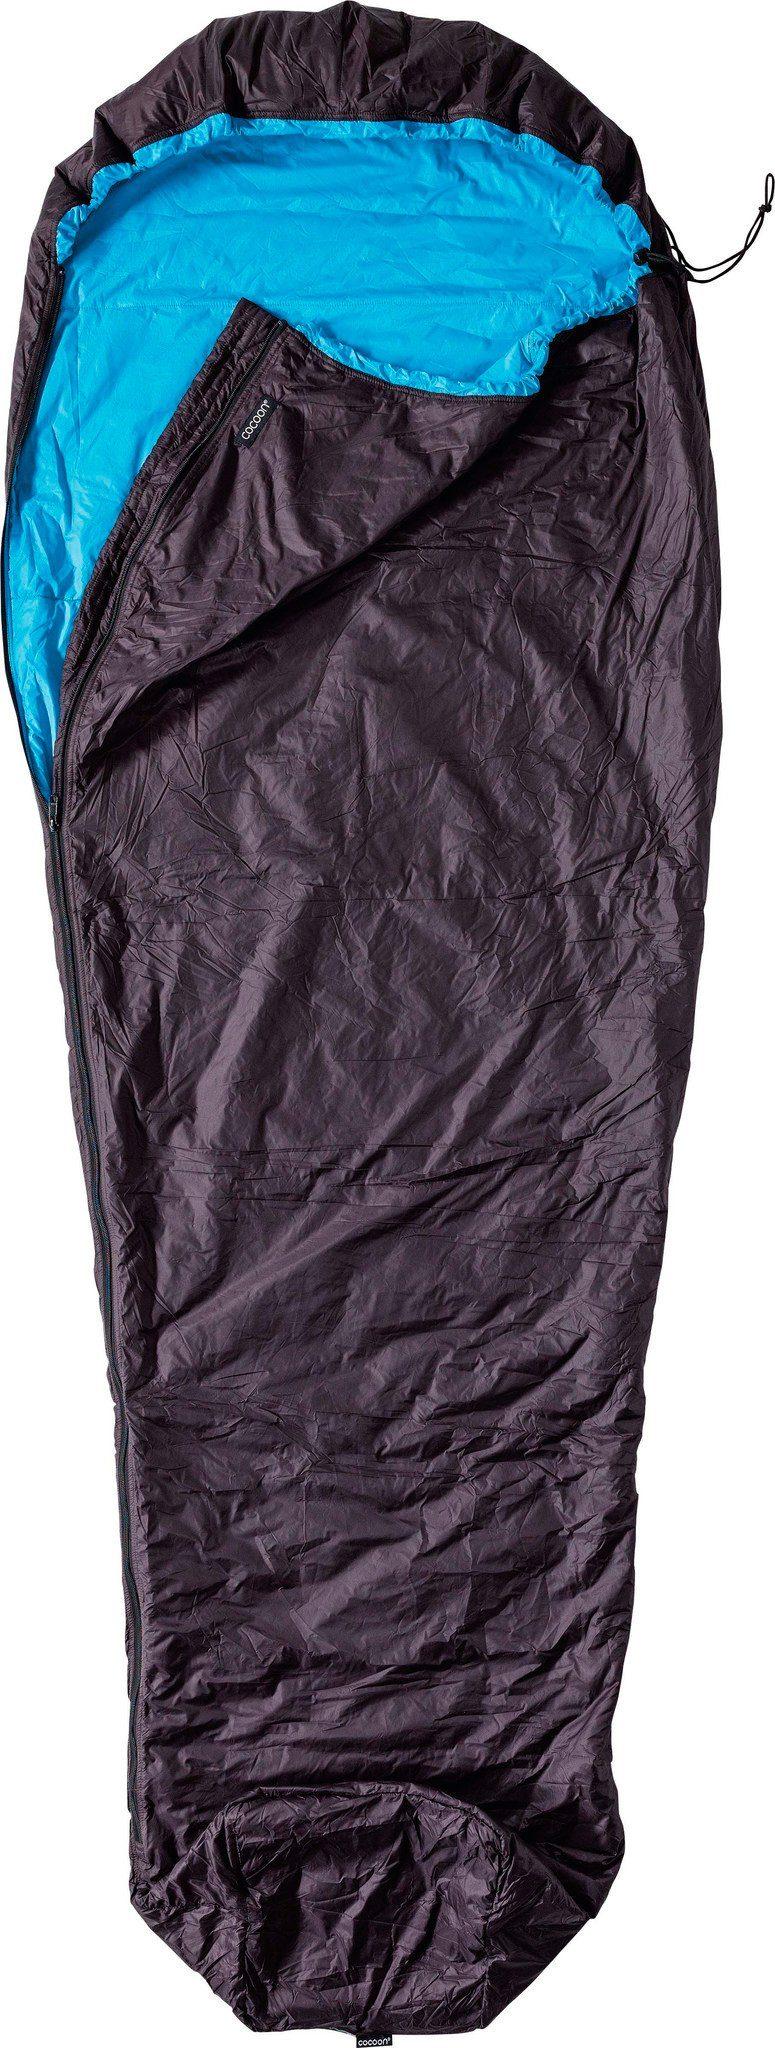 Cocoon Schlafsack »Inner Bag Ripstop Nylon/Primaloft Left«